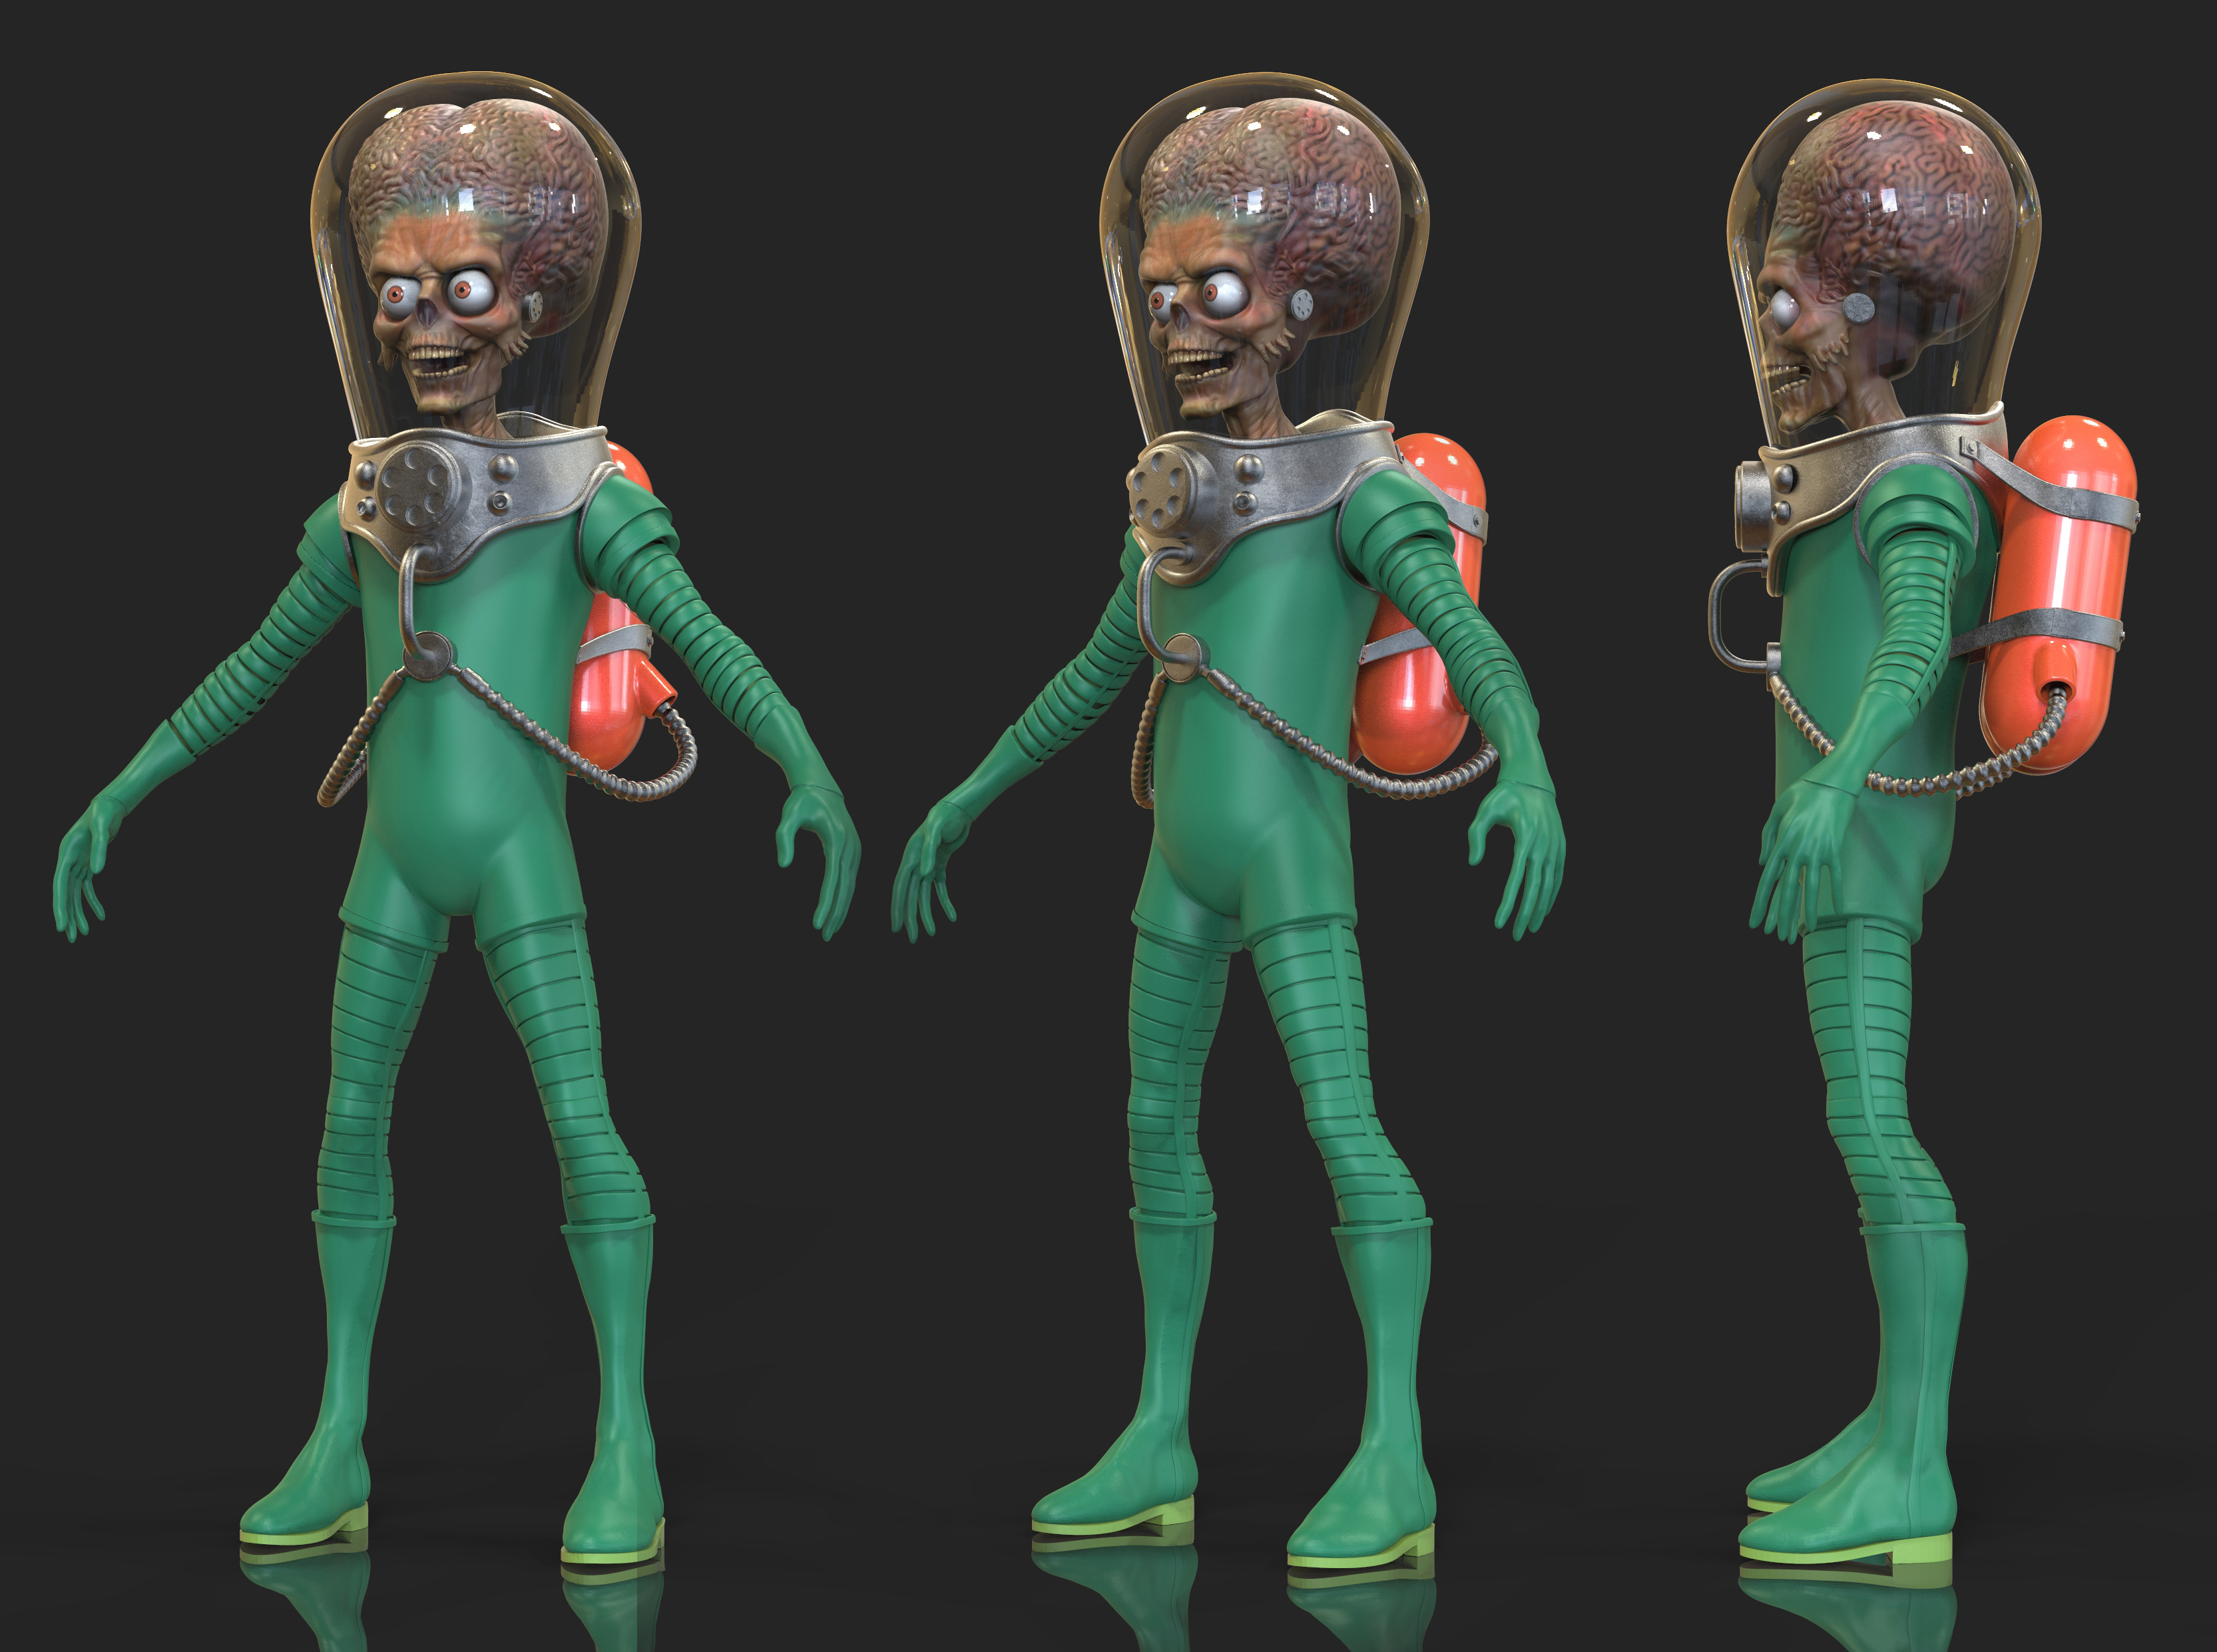 More Mars Attack Alien 3D Progress by FoxHound1984